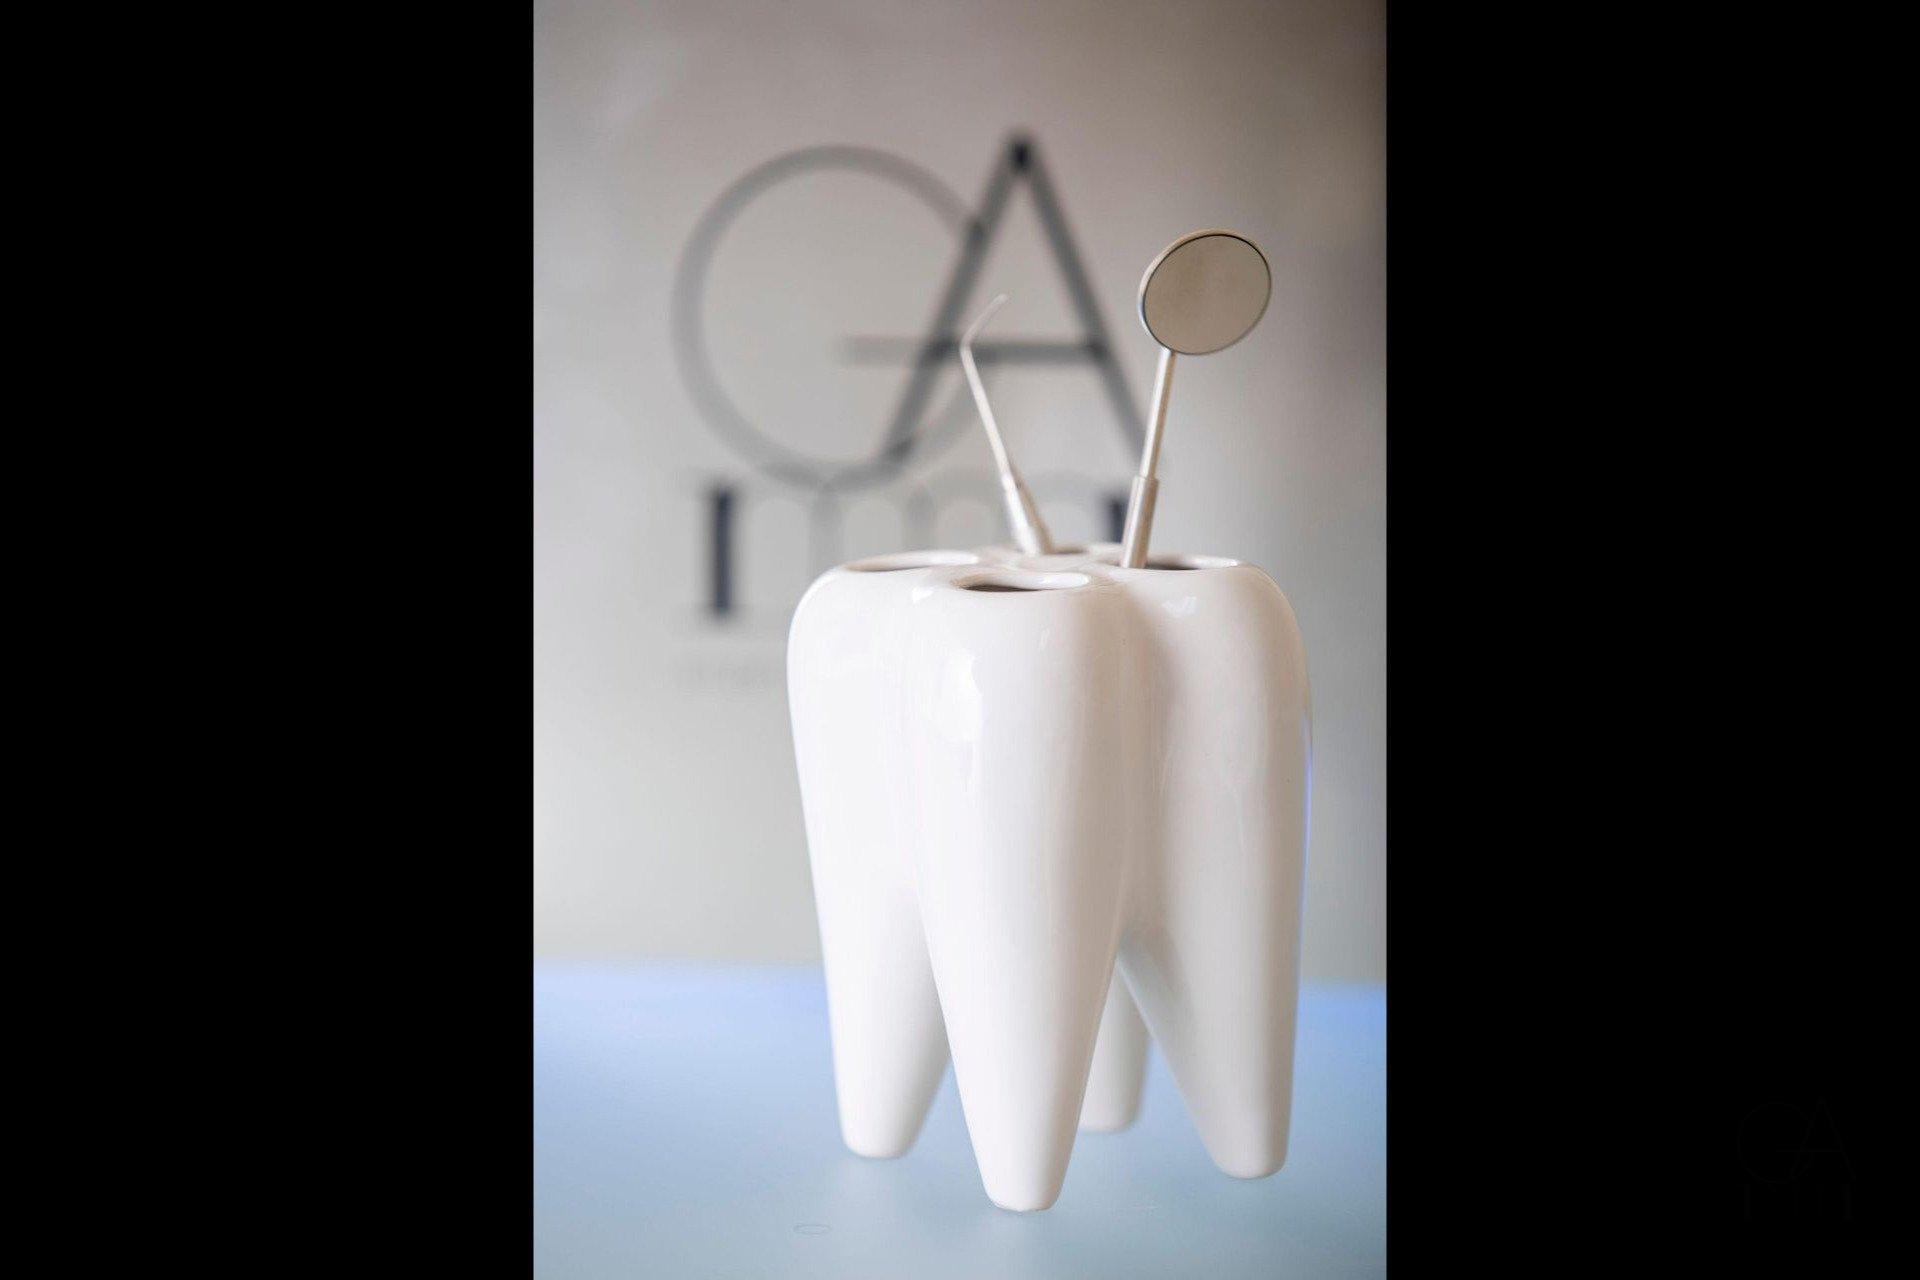 Studio Odontoiatrico Mariapina Alfano - Odontoiatria Conservativa